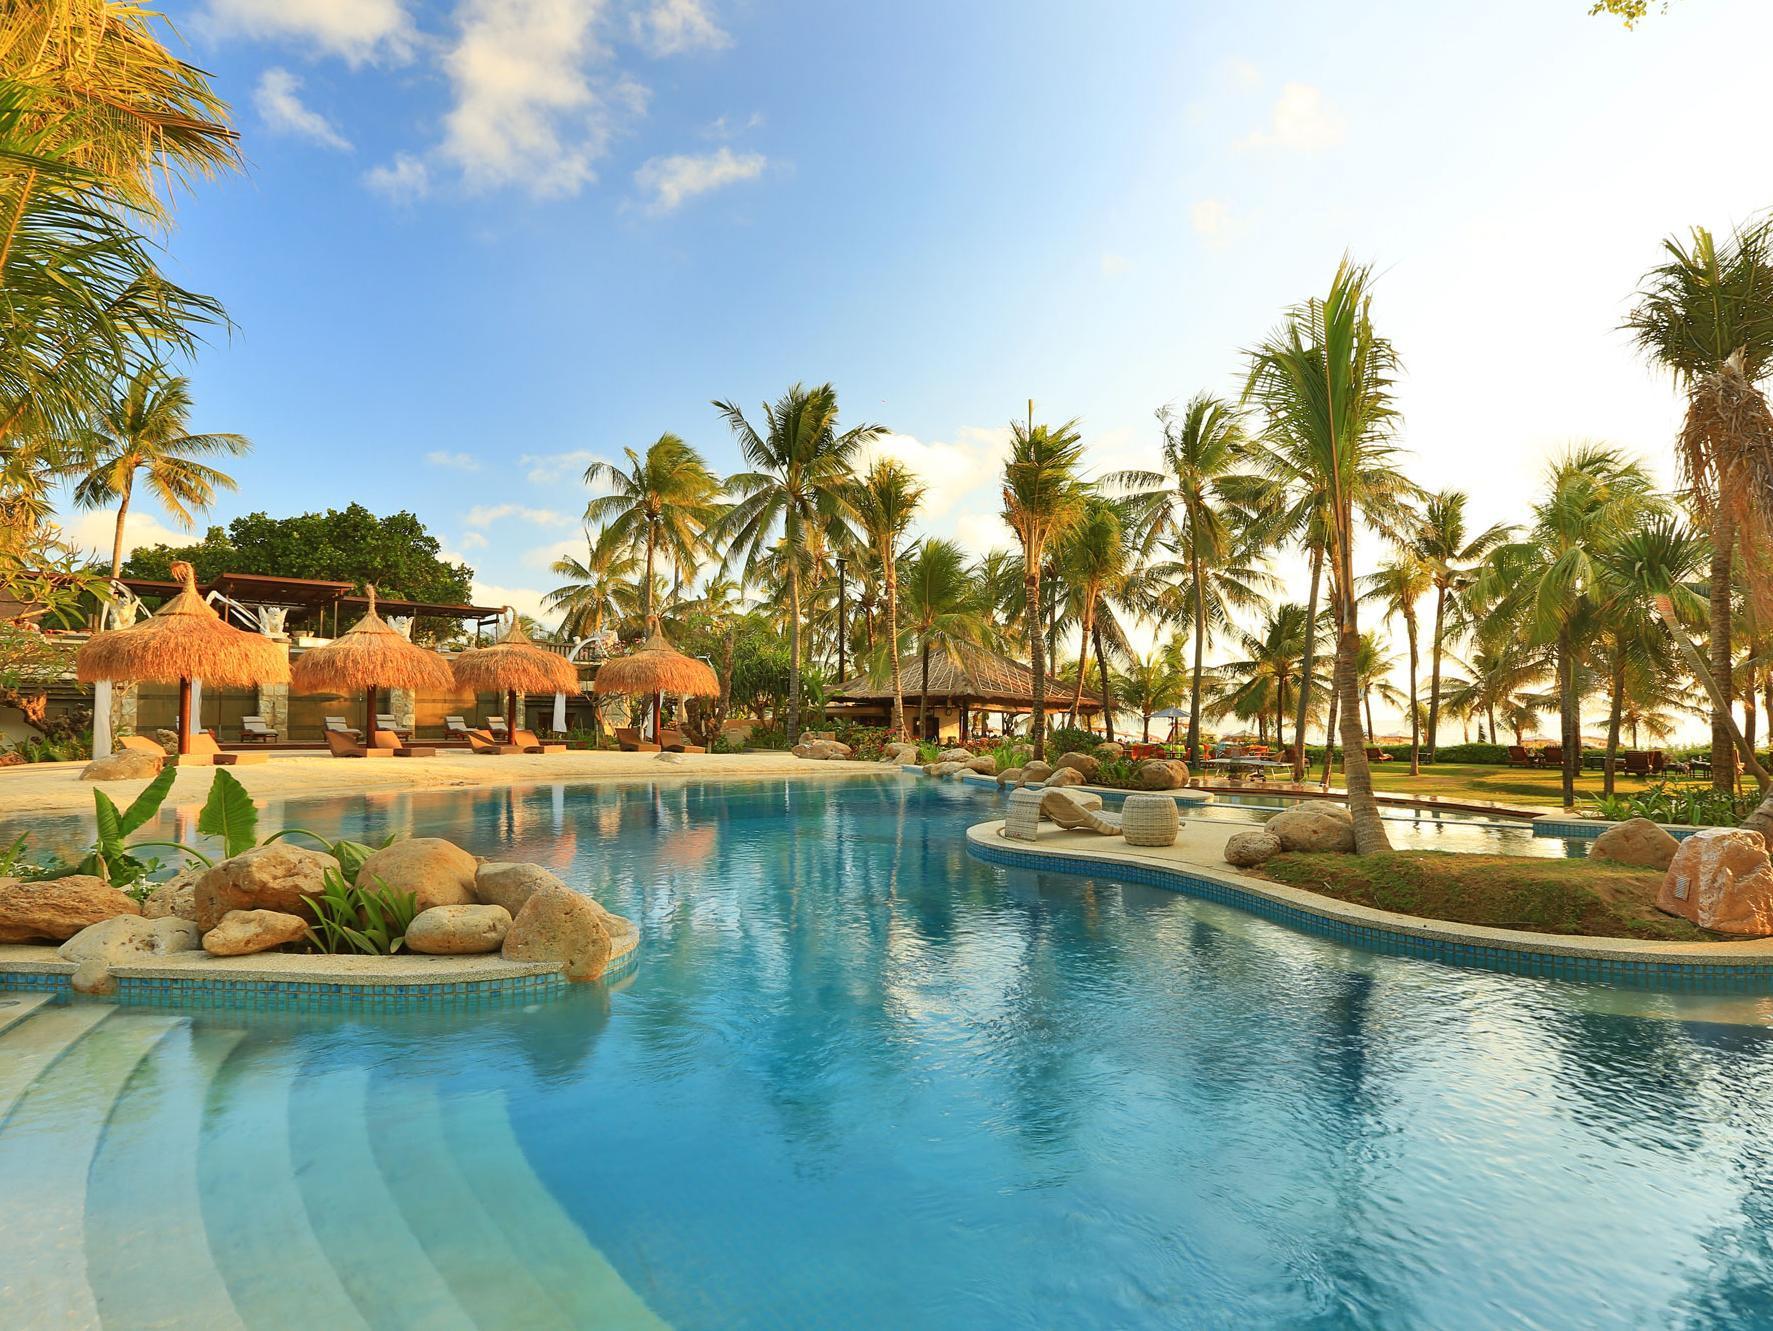 Bali Mandira Beach Resort & Spa - Bali